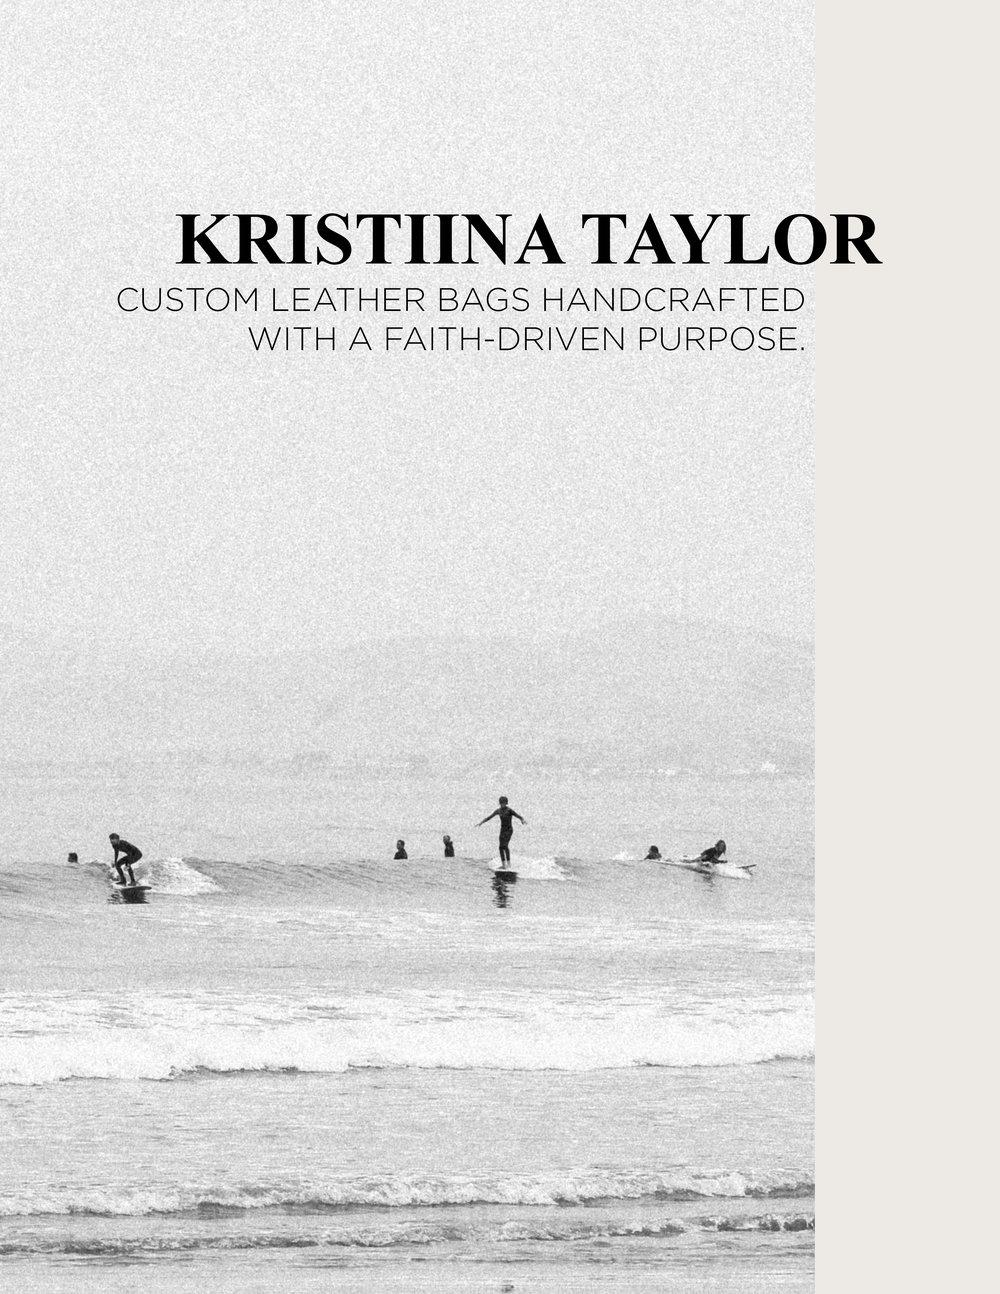 Branding: Kristiina Taylor